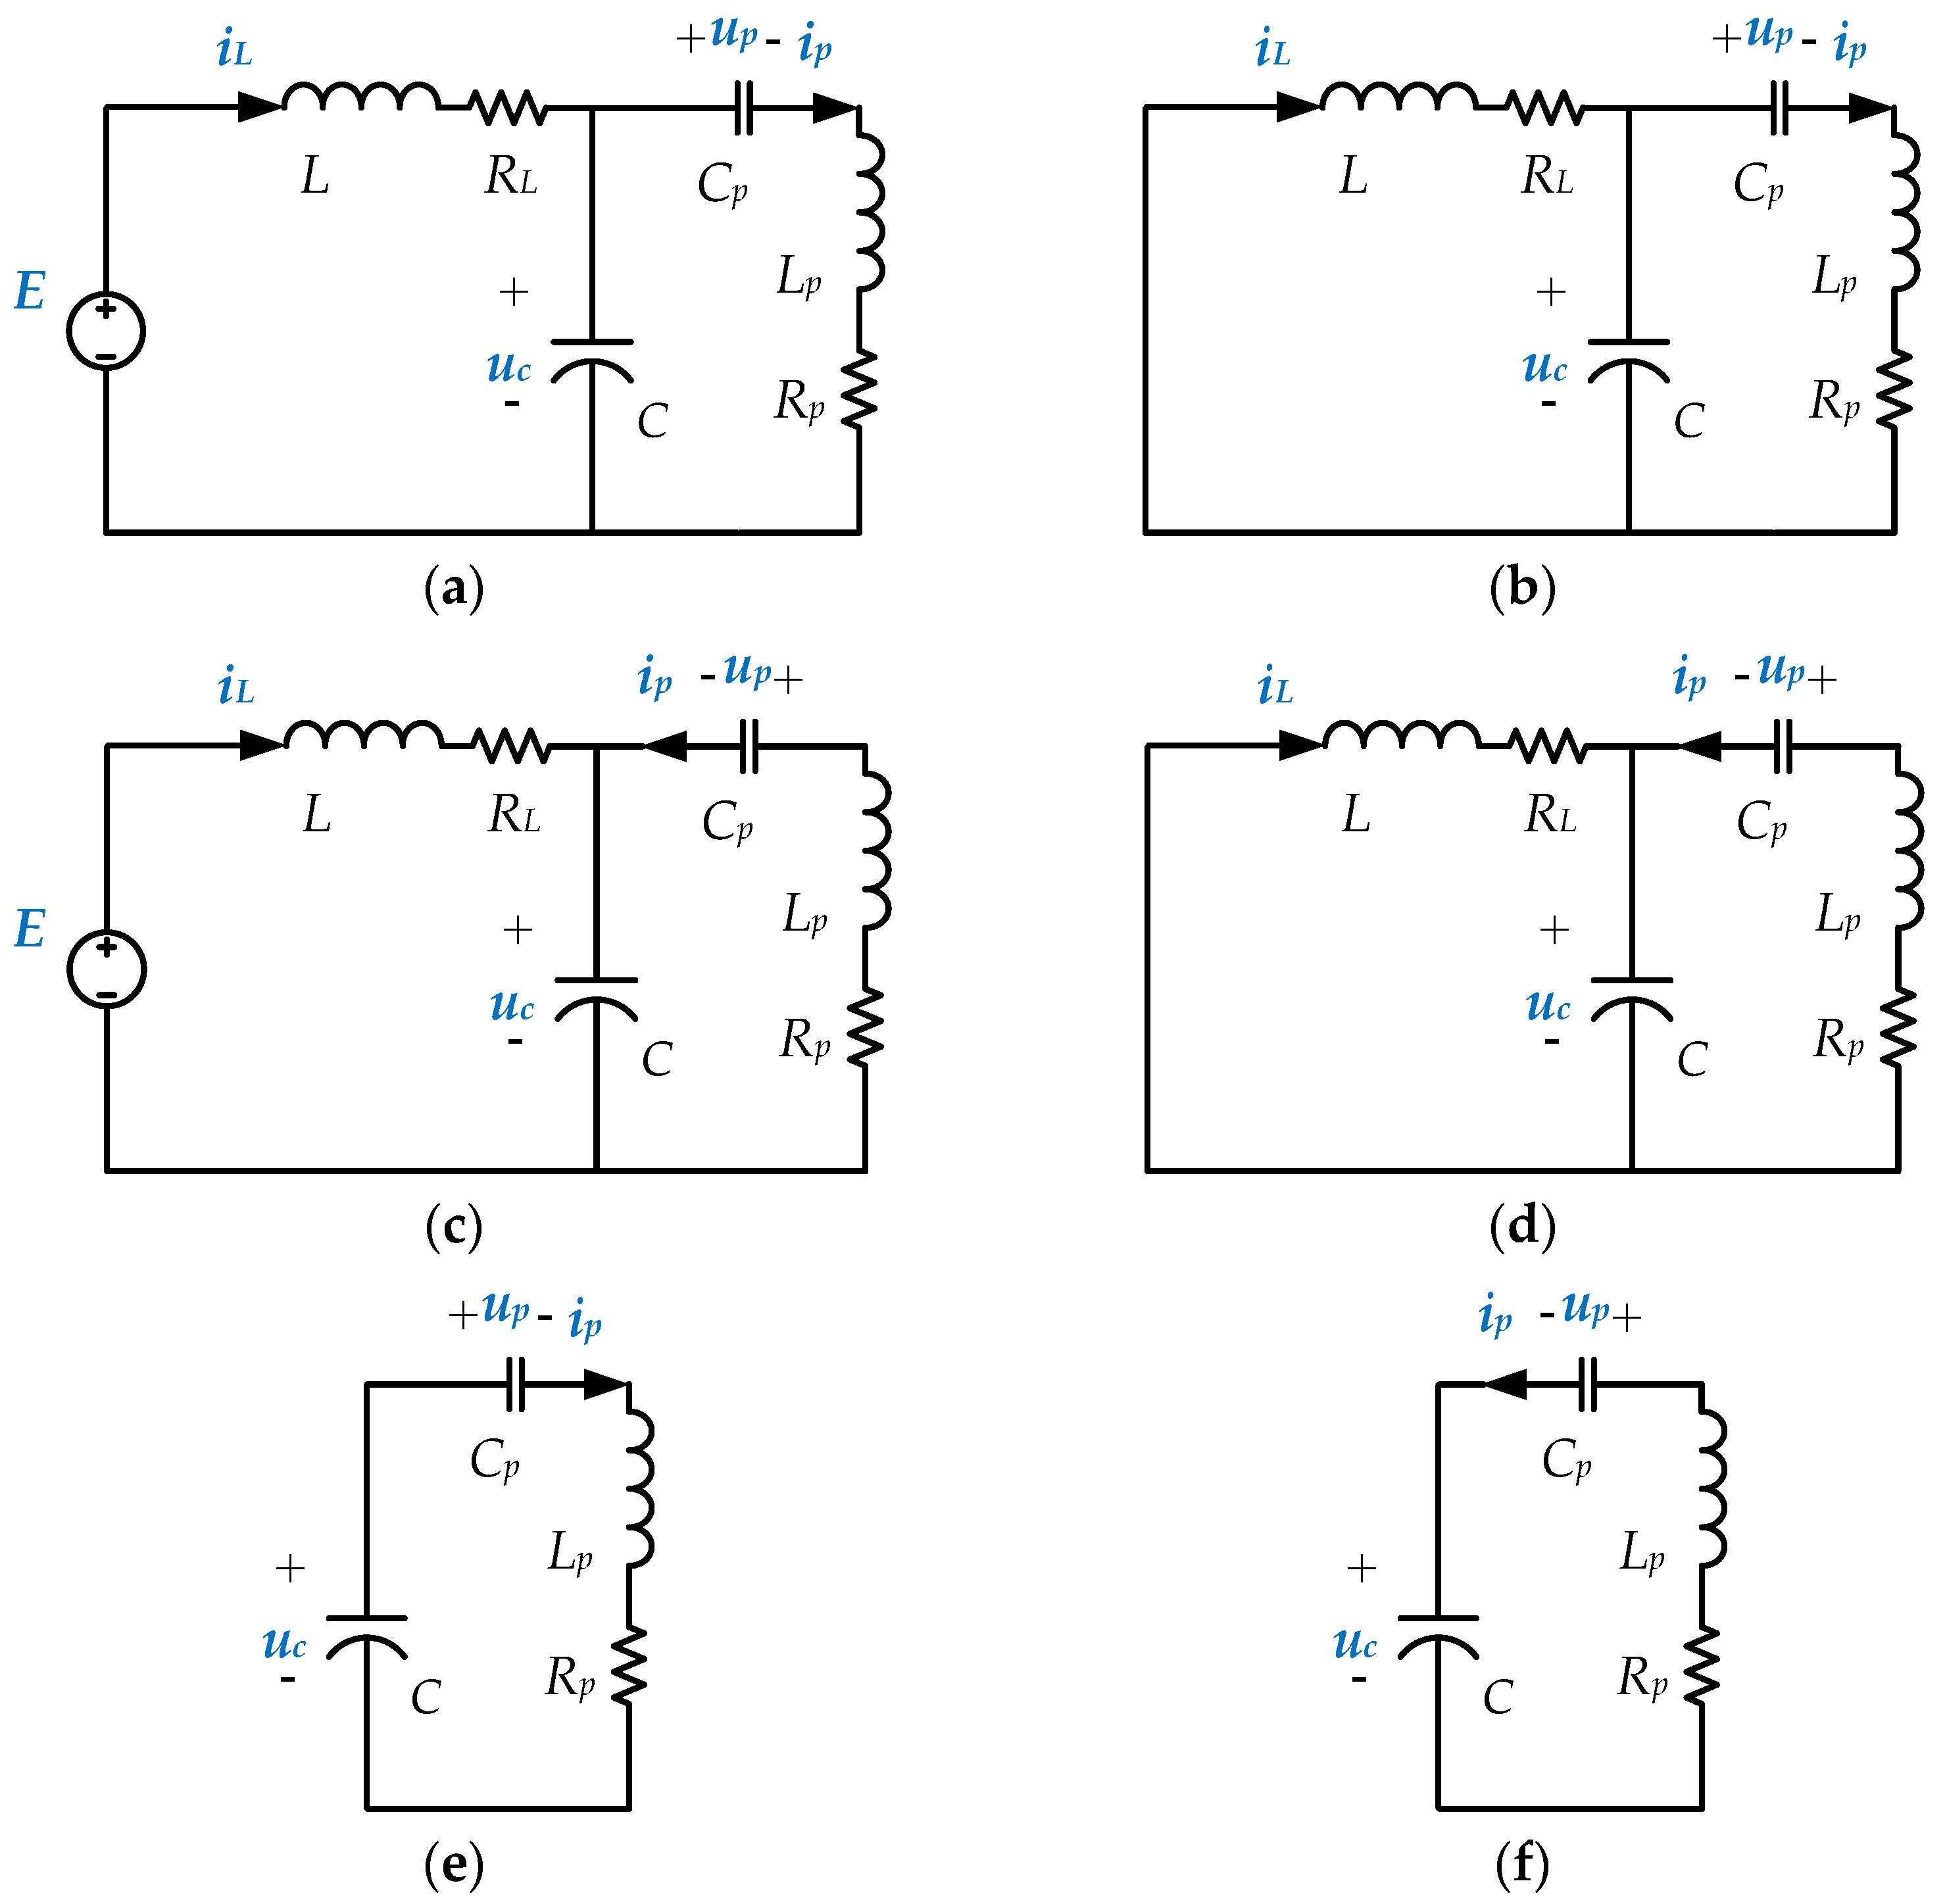 Energies Free Full Text Bifurcation Phenomena Studies Of A Dc To Ac Inverter Circuit Moreover Buck Boost Converter 10 00708 G002